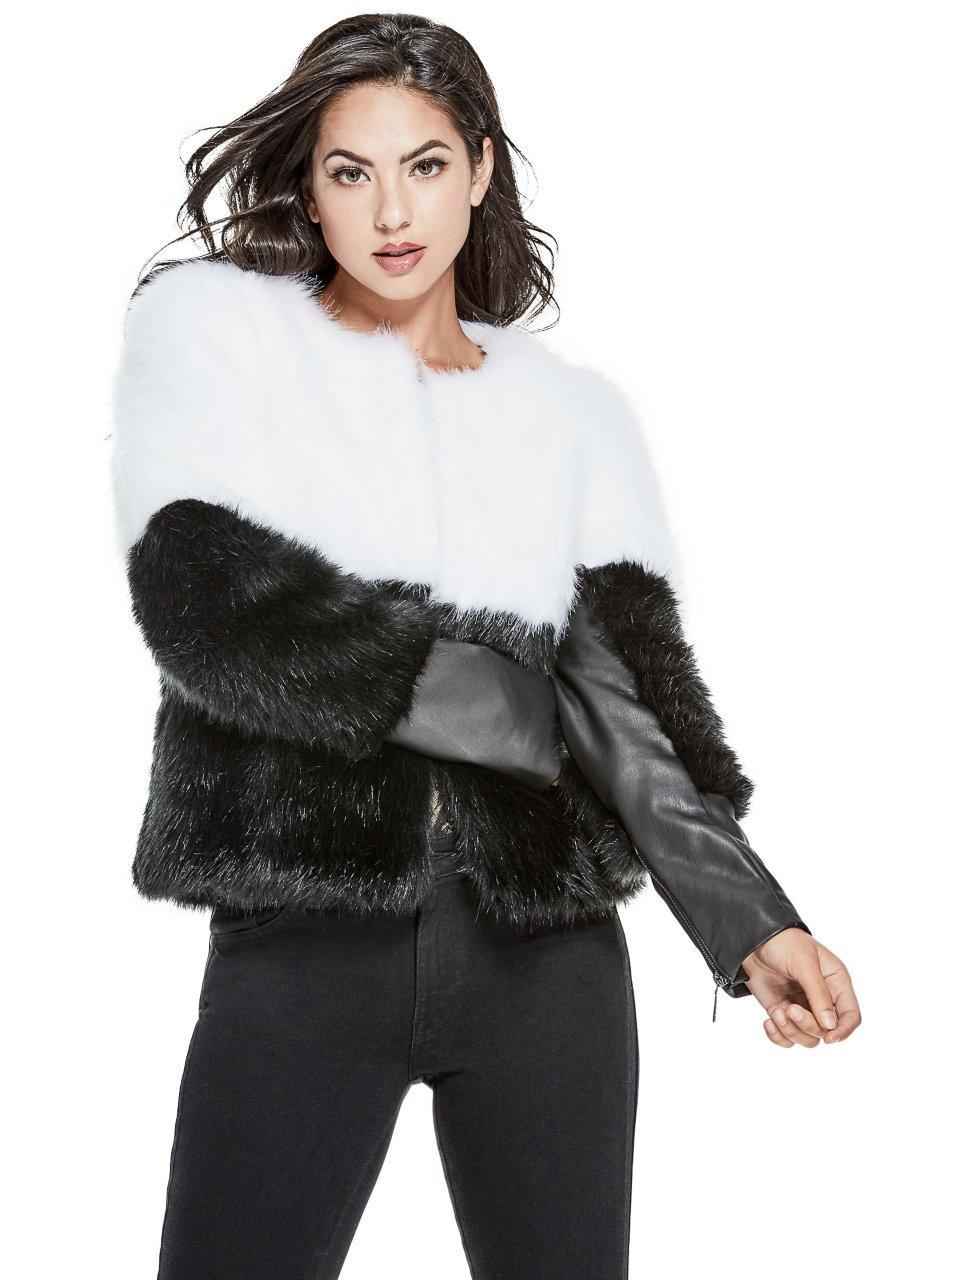 Guess Women's Long Sleeve Sammi Faux Fur Jacket, Jet Black/Multi, L